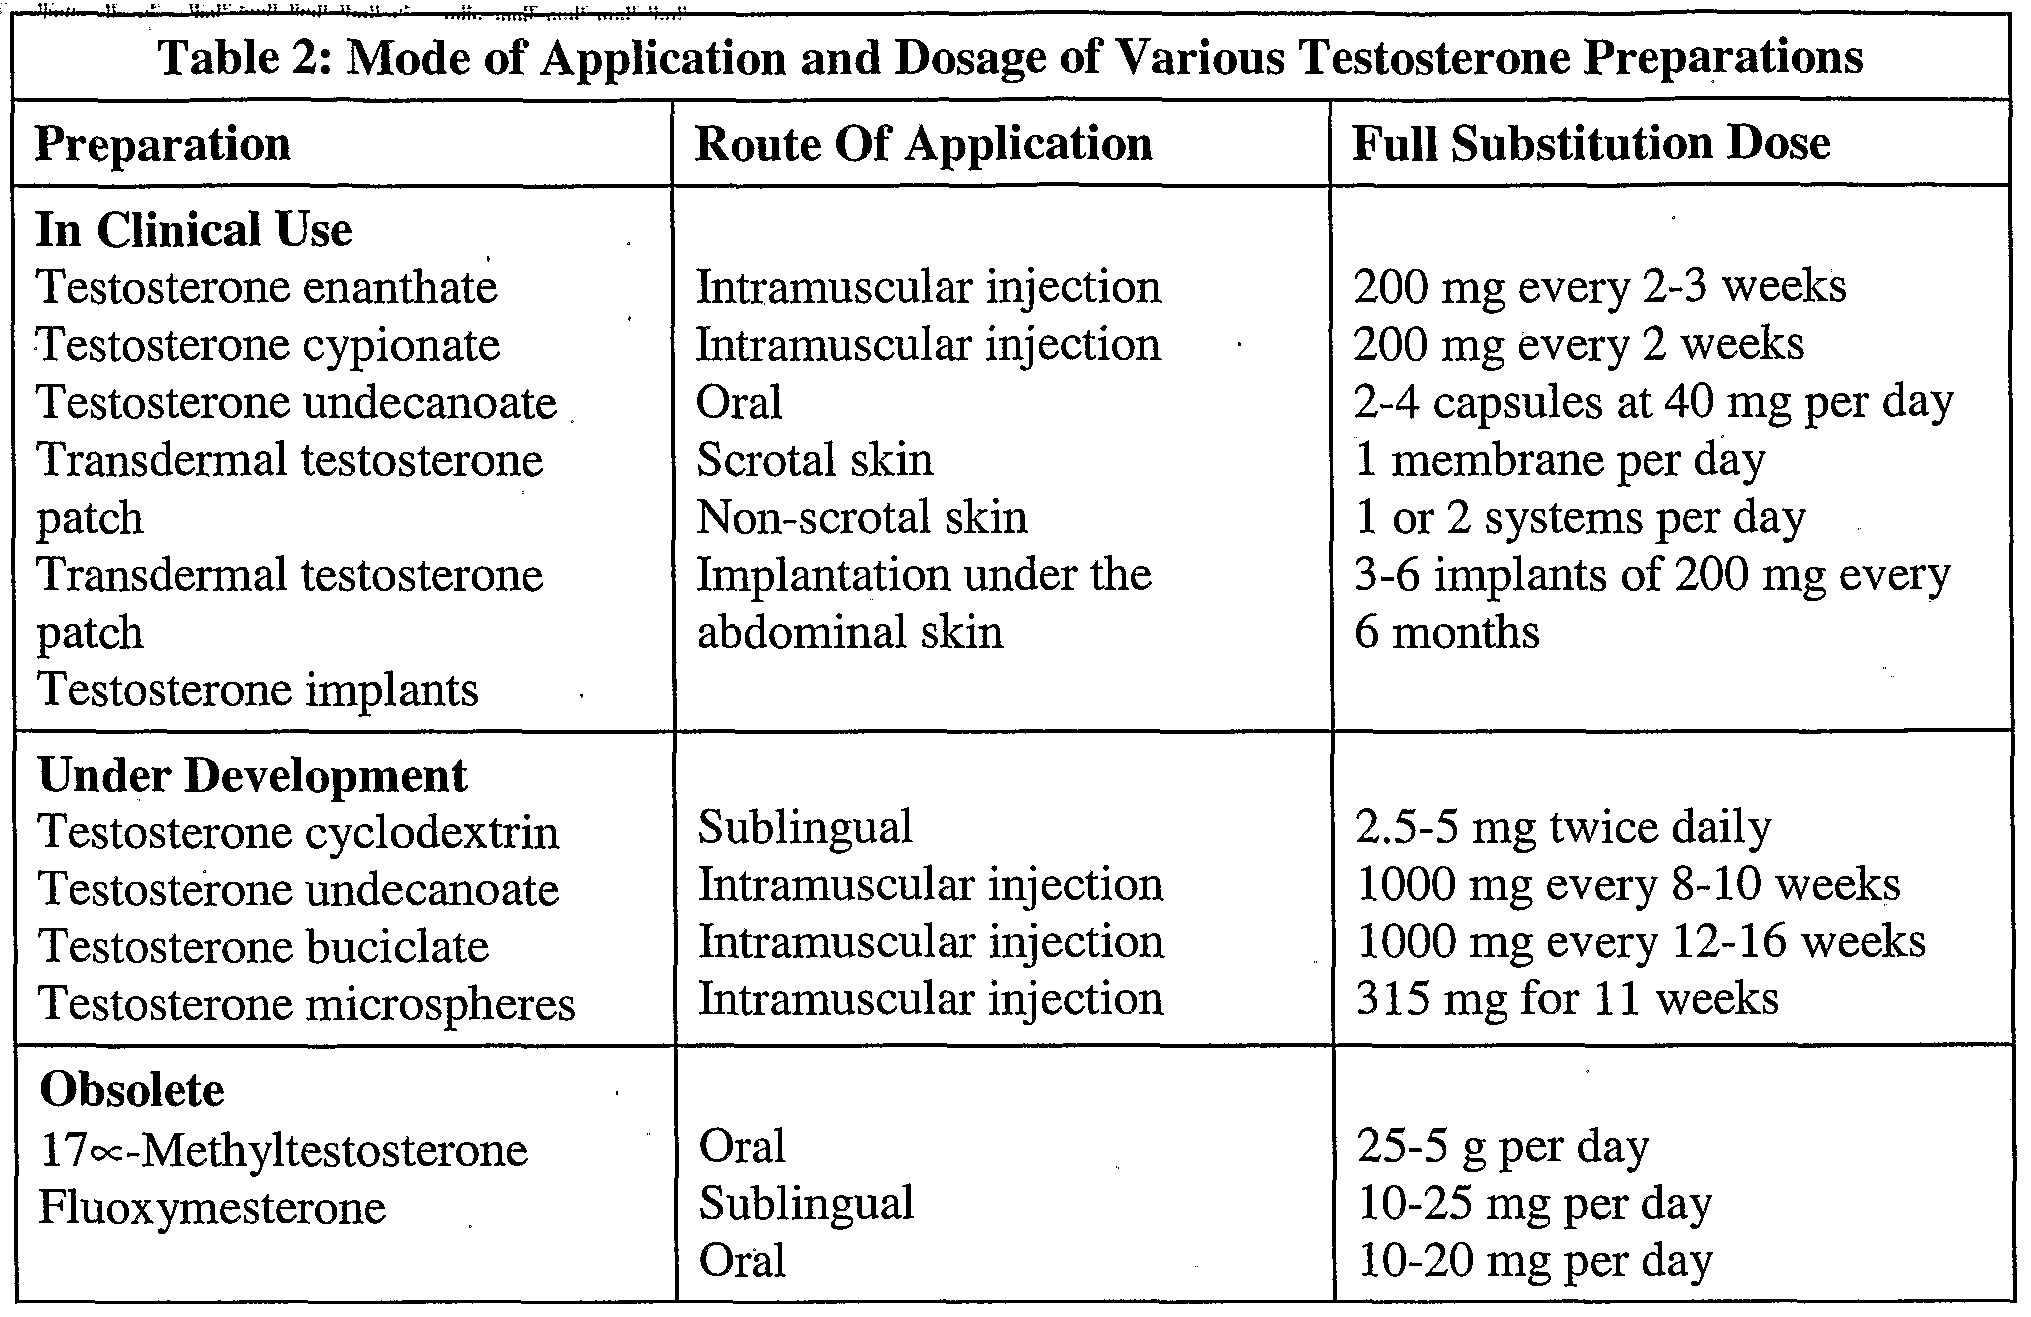 steroid pellet implants